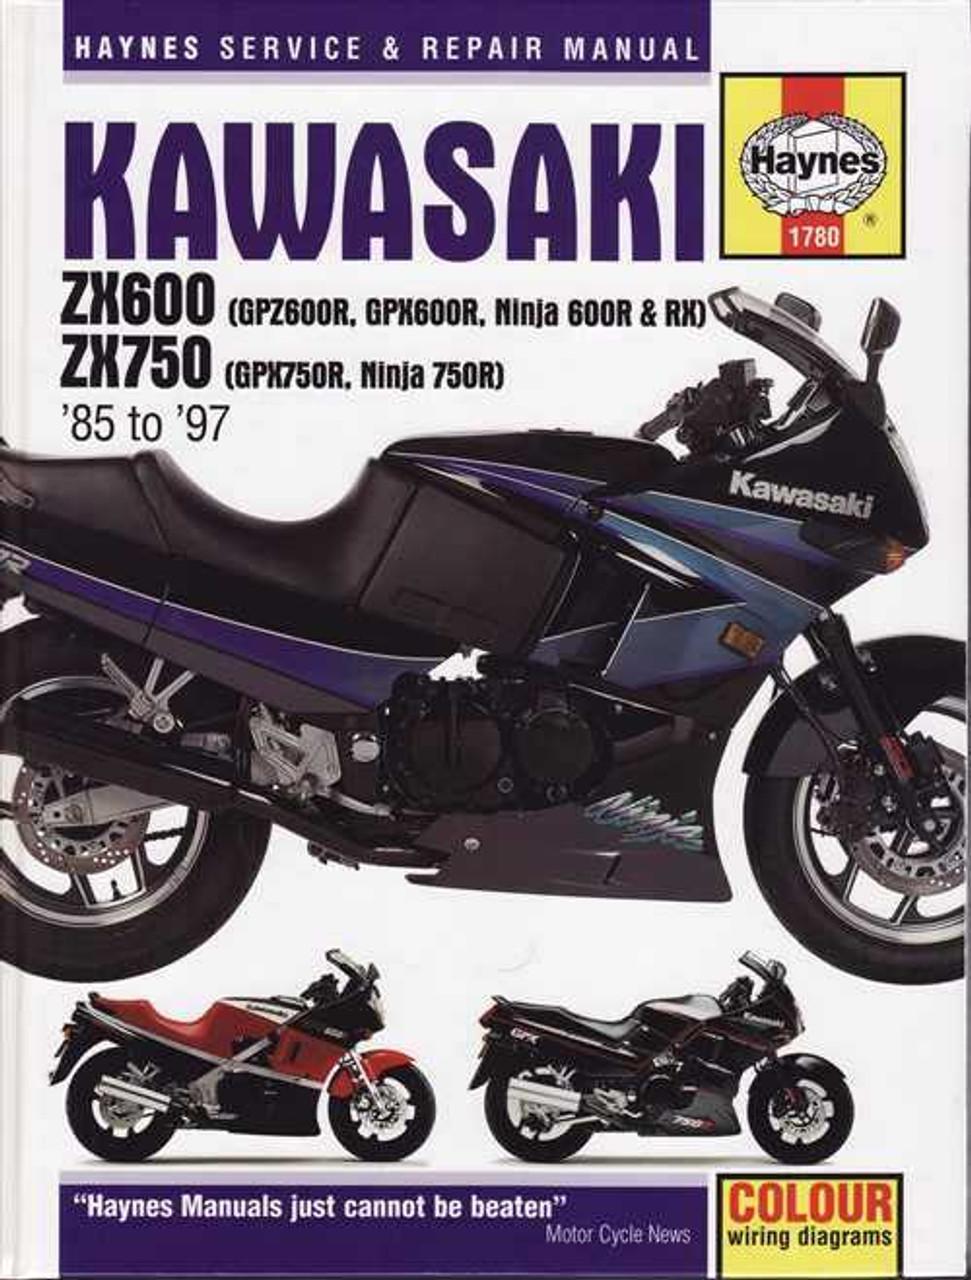 Kawasaki zx600 zx750 1985 1997 workshop manual asfbconference2016 Gallery